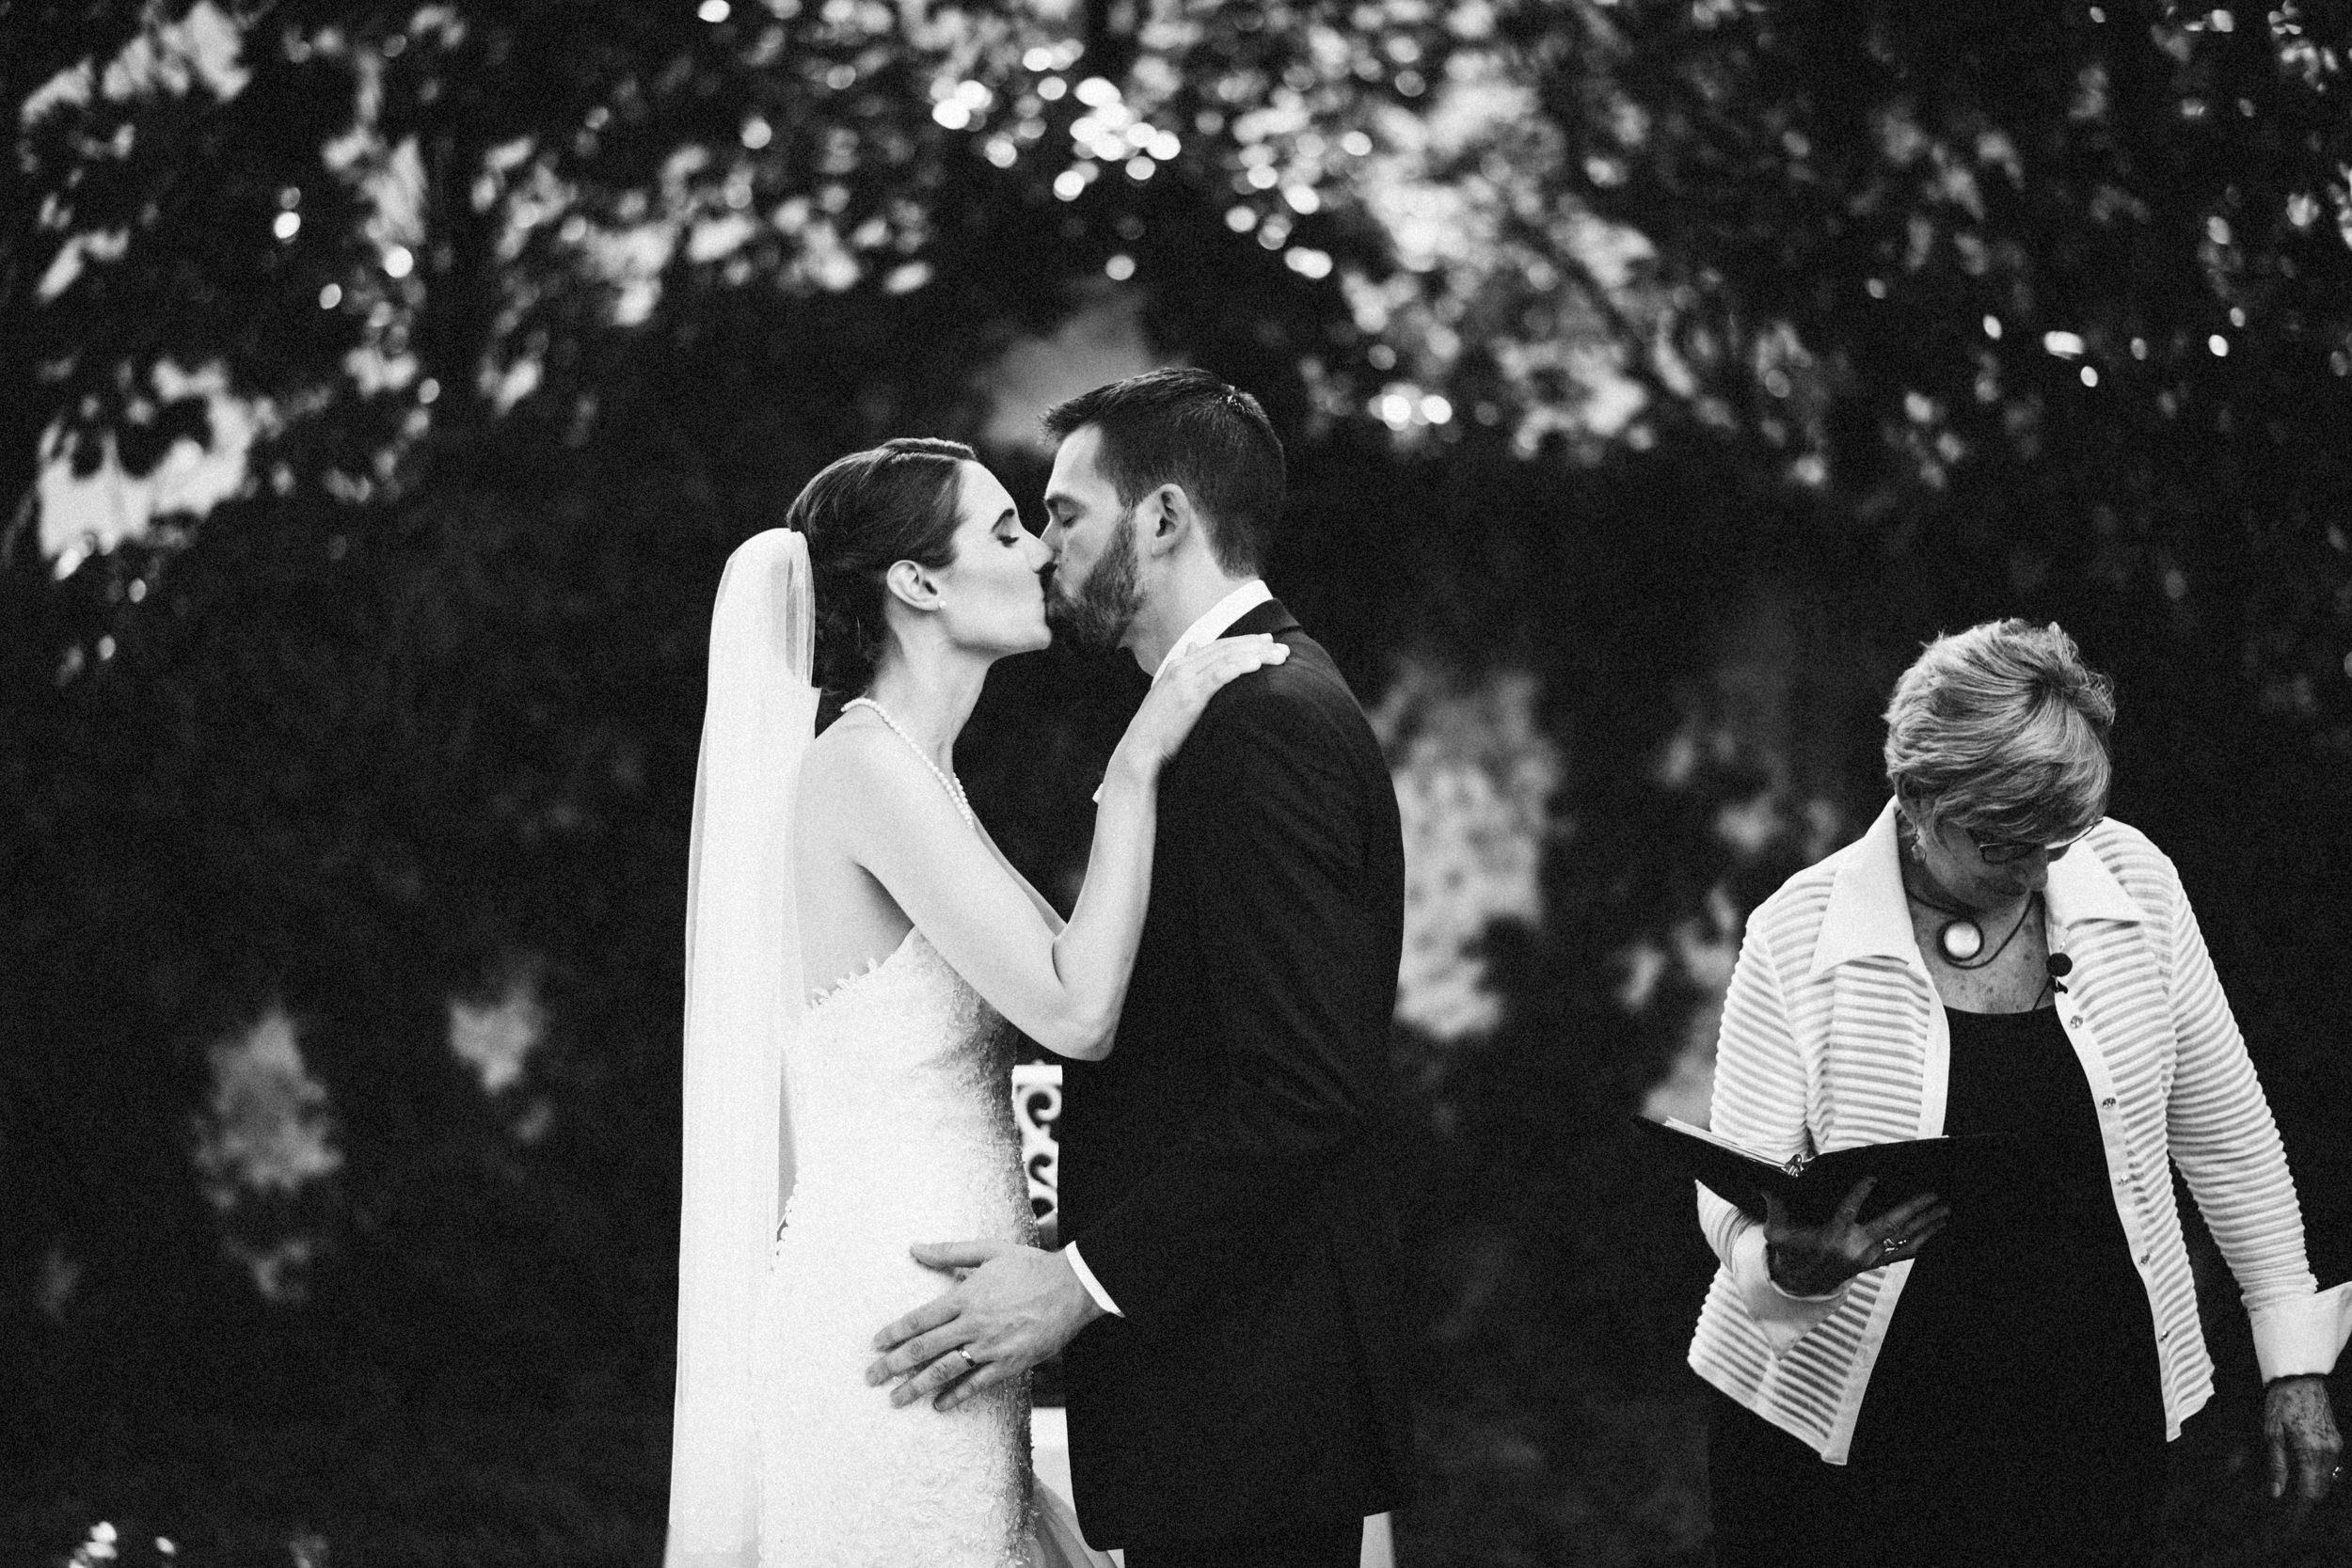 Louisville-Kentucky-Wedding-Elopement-Photographer-Sarah-Katherine-Davis-Photography-Whitehall-Classic-Timeless-Garden-Wedding-423.jpg